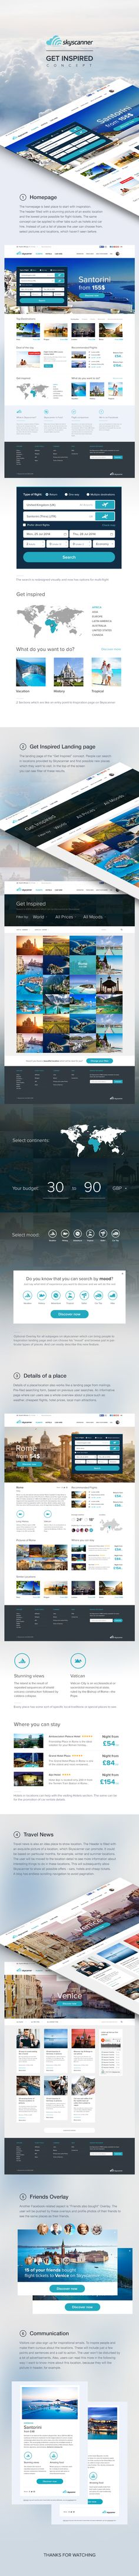 SkyScanner Website Design - Case Study